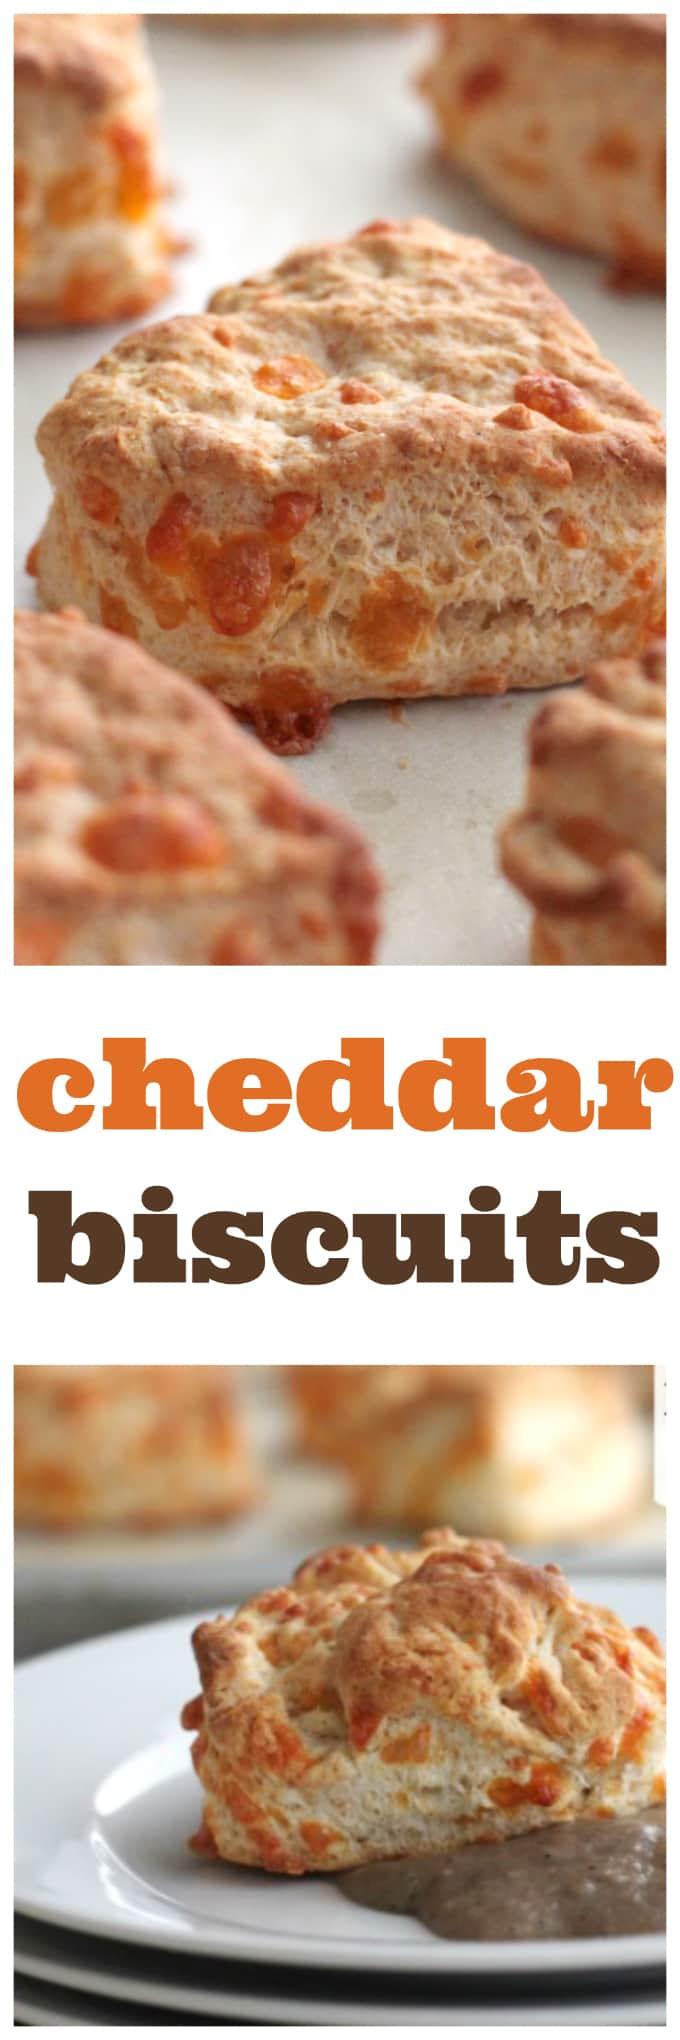 cheddar biscuits @createdbydiane